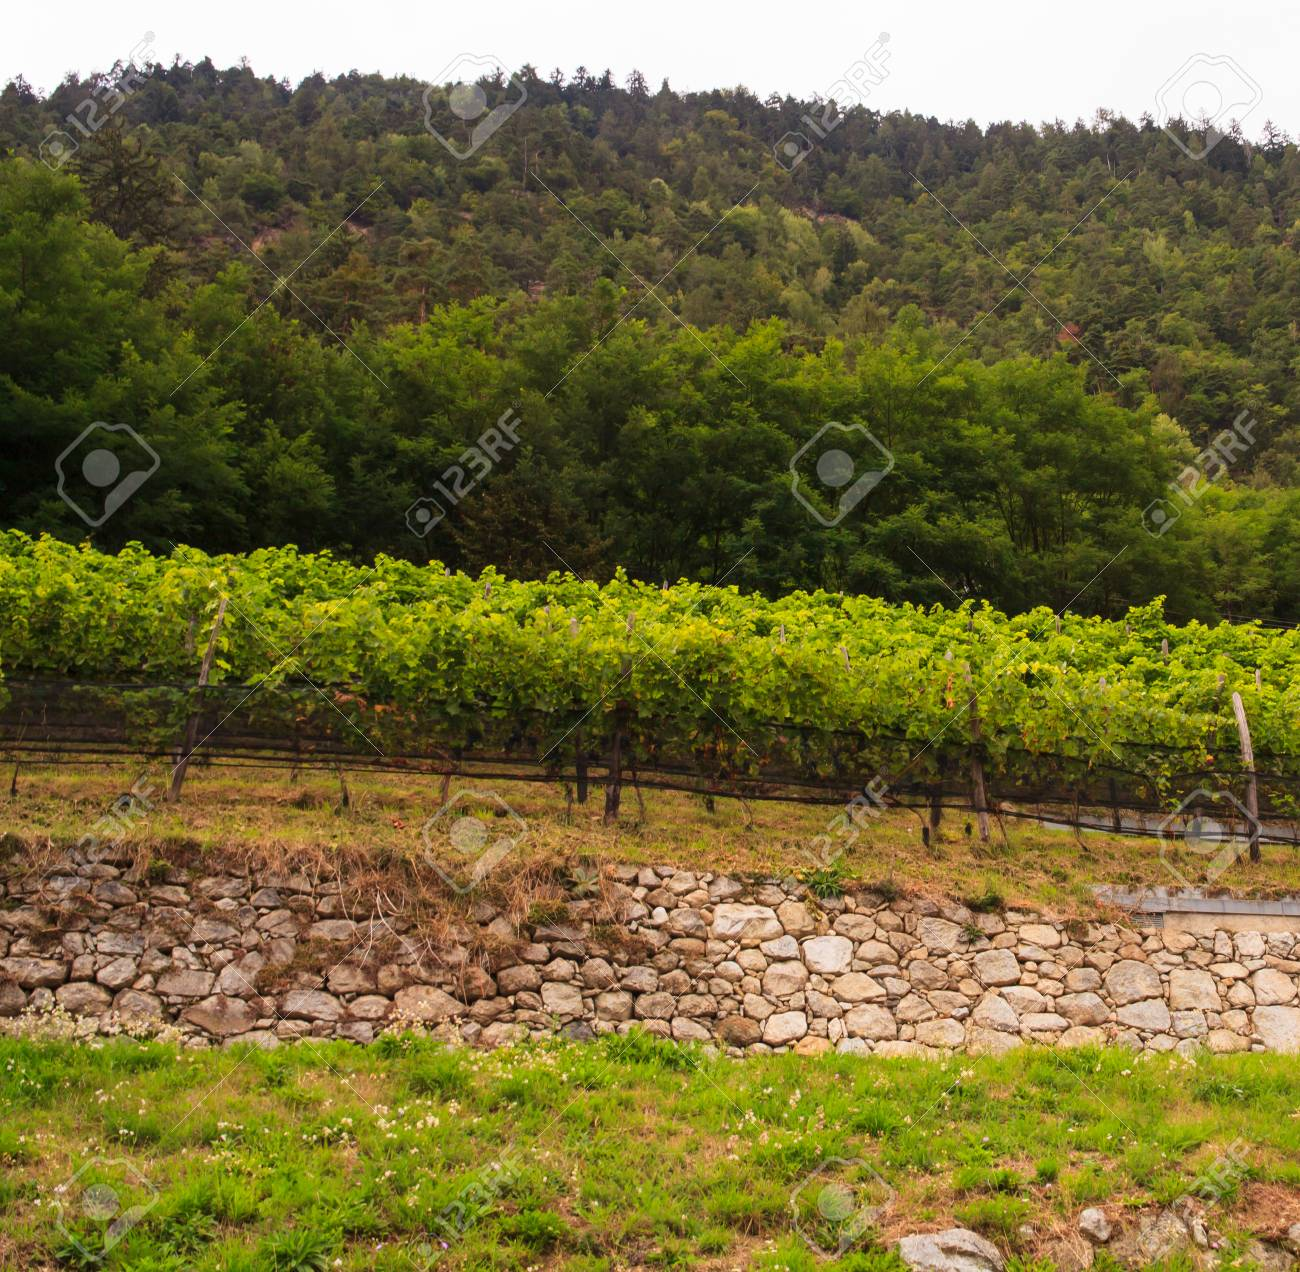 View of vineyard in Trentino Alto Adige Stock Photo - 22915568